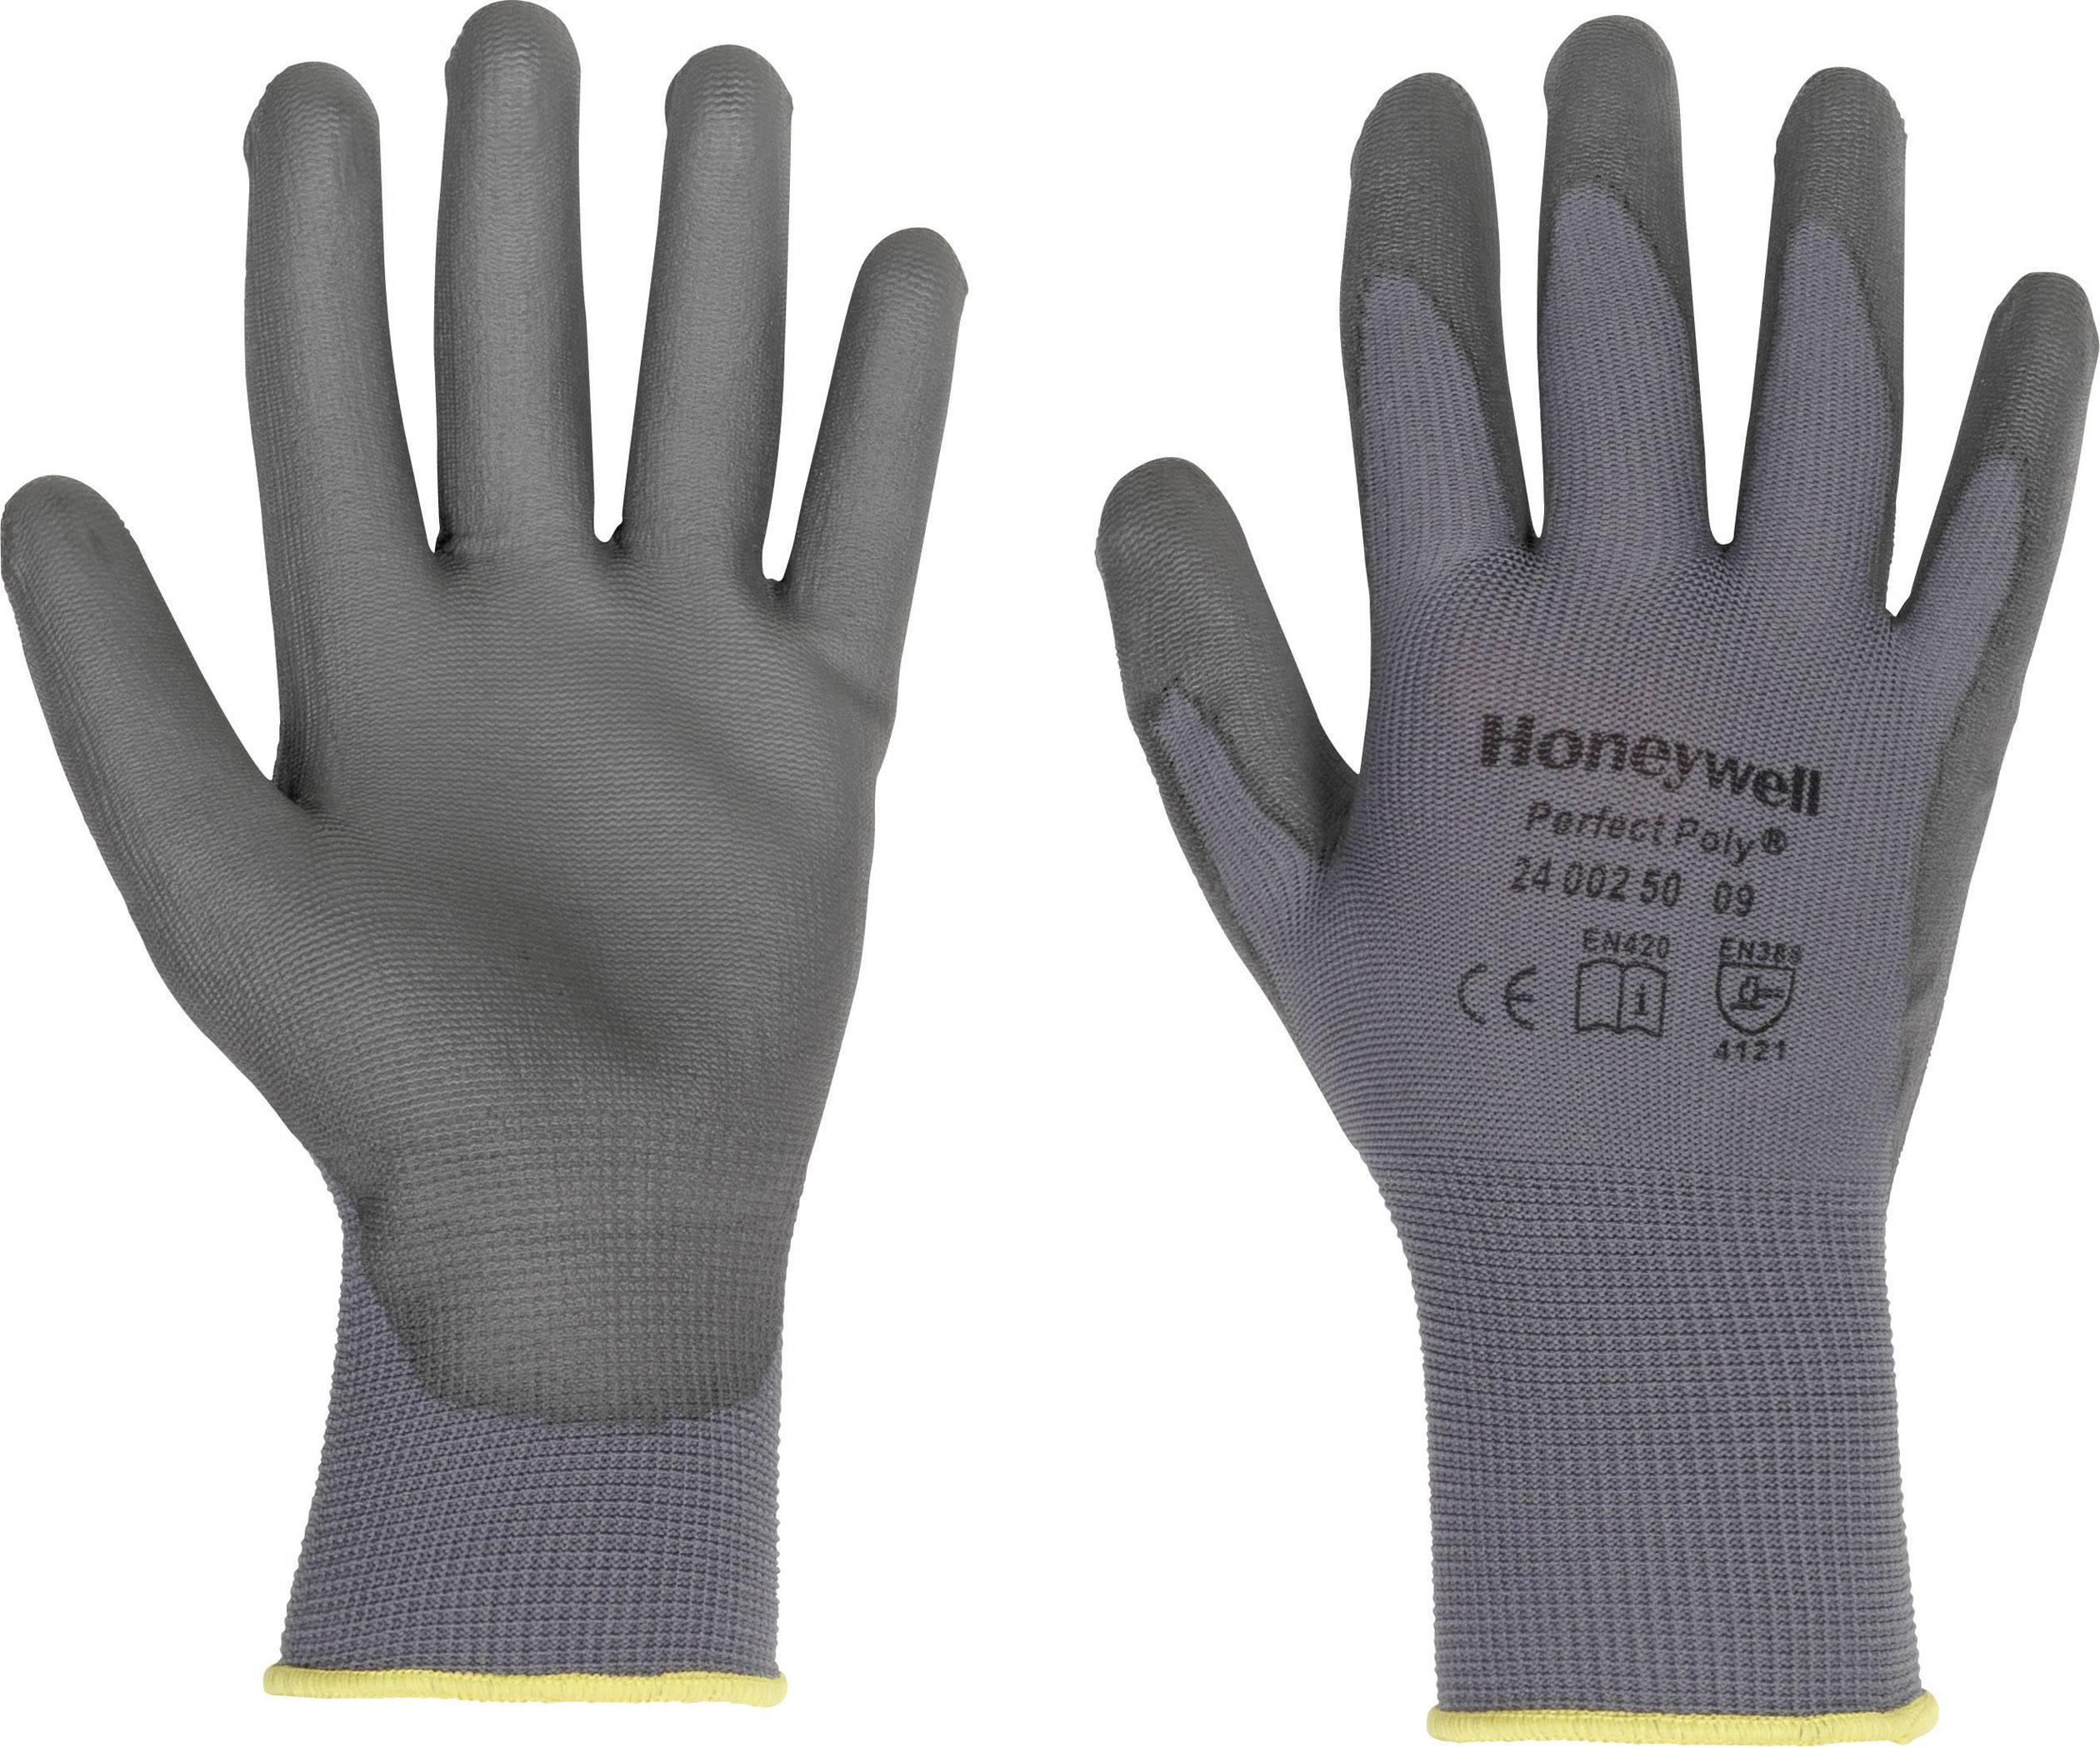 Pracovné rukavice Perfect Fit GANTS GRIS PERFECTPOLY 2400250, velikost rukavic: 10, XL